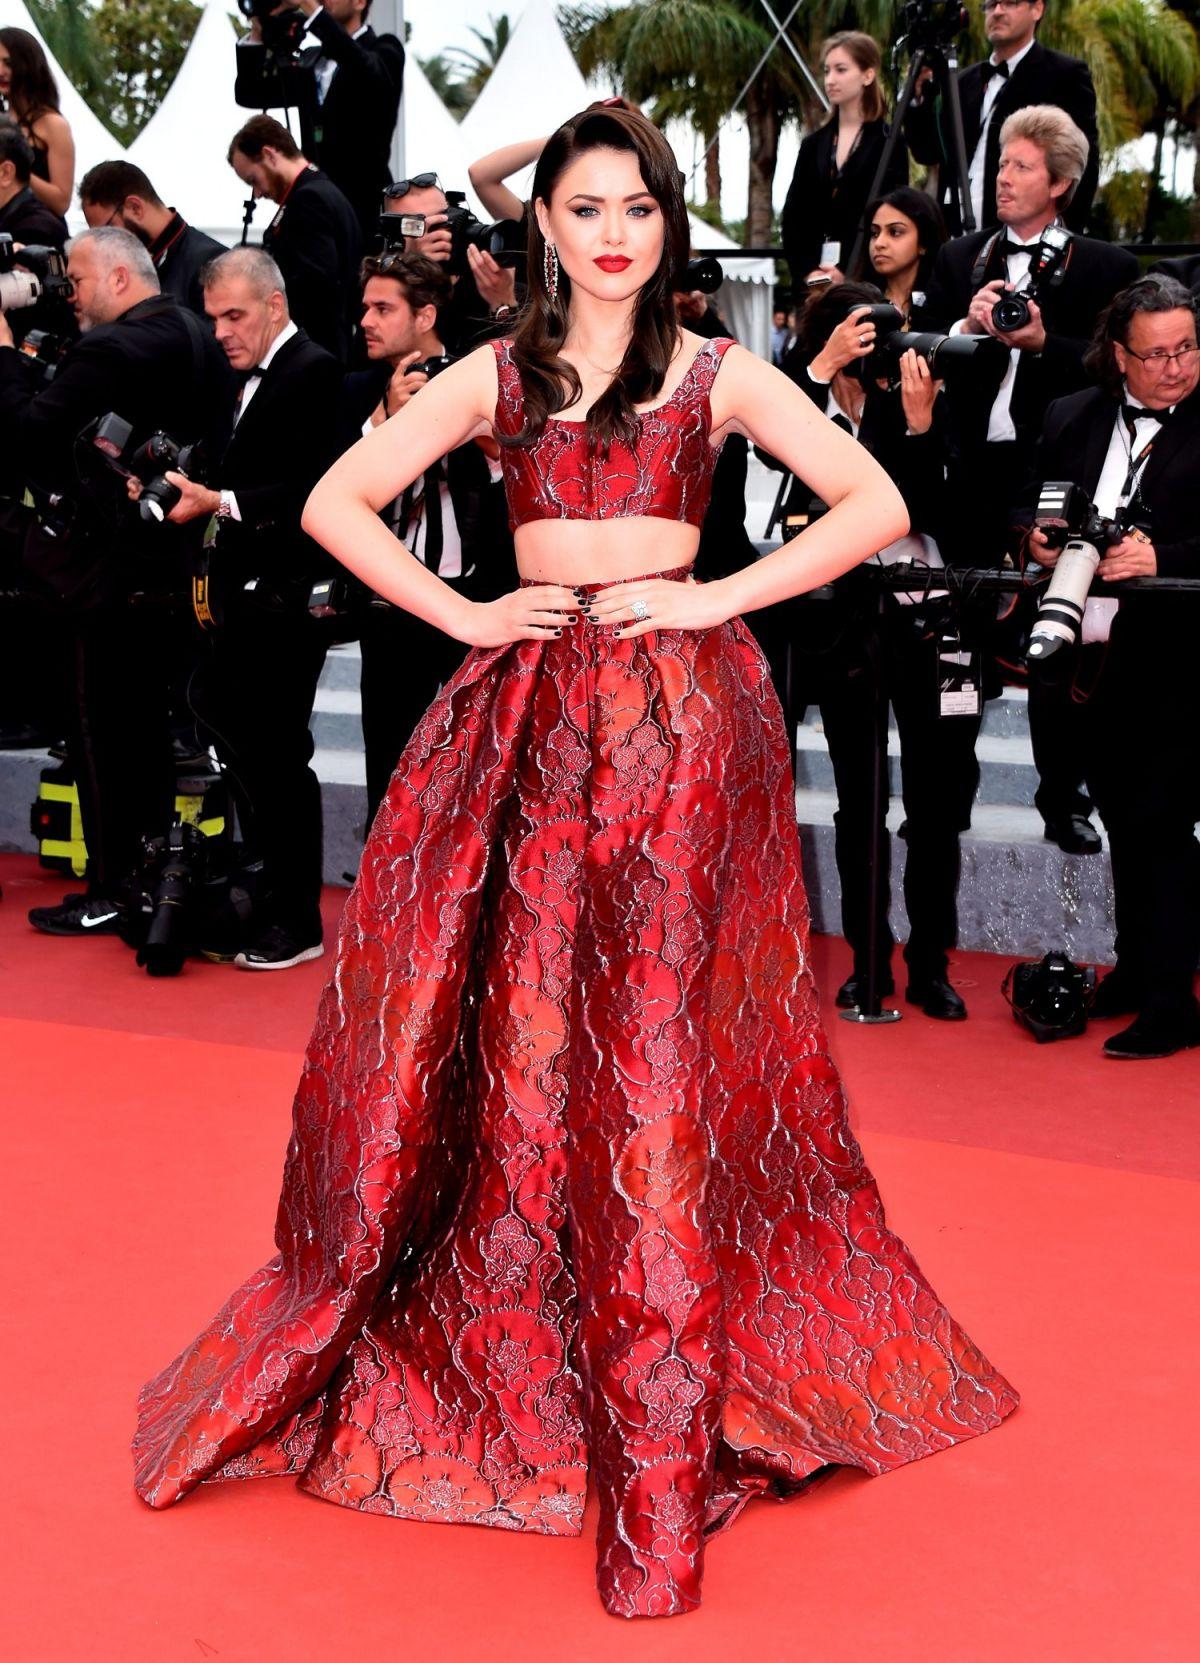 KRISTINA BAZAN at 'Slack Bay' Premiere at 69th Cannes Film Festival 05/43/2016